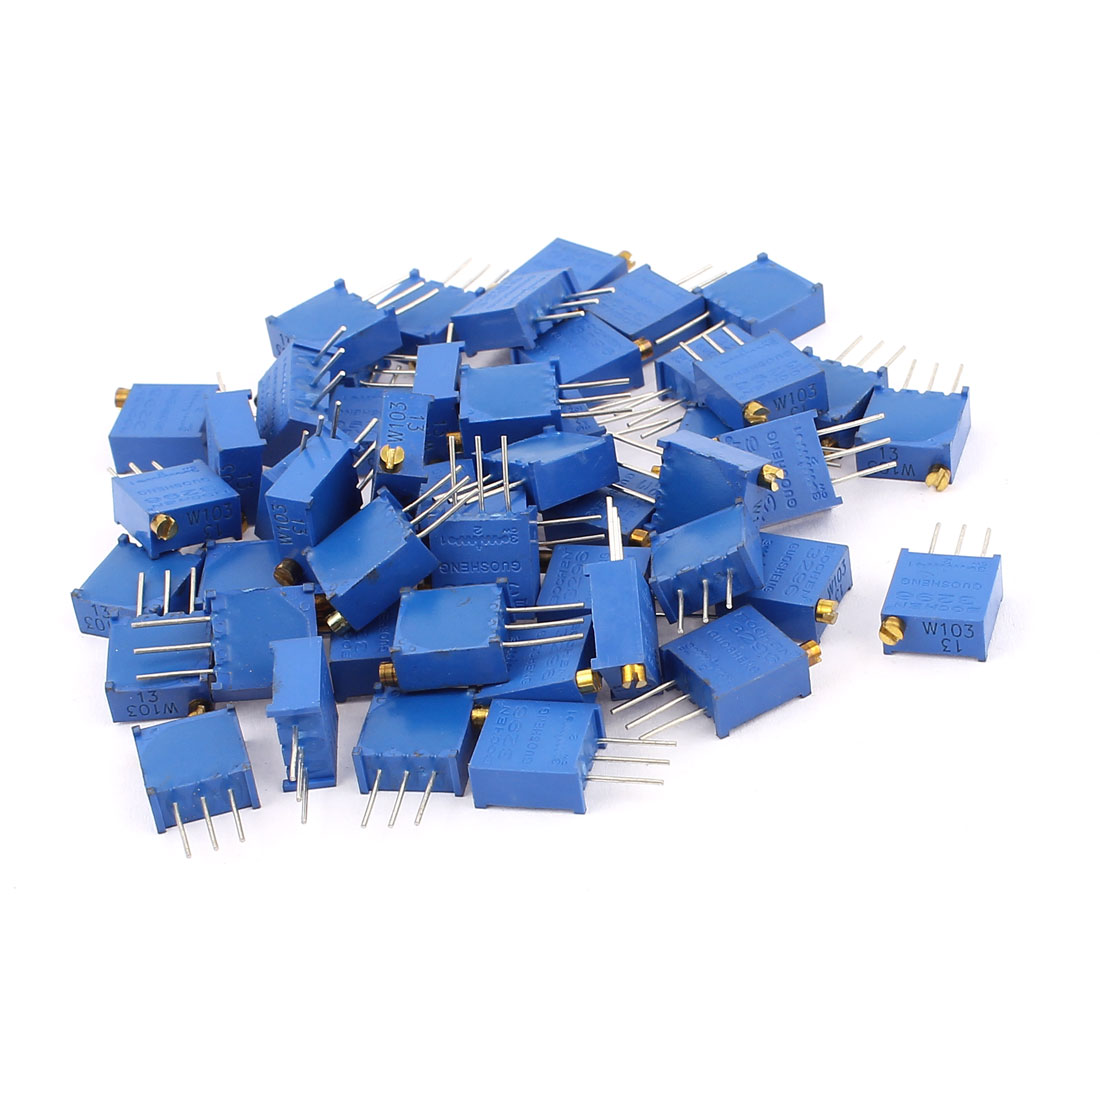 50Pcs 3296W-103 10K Ohm Resistor Trim Pot Potentiometer Trimmer Blue